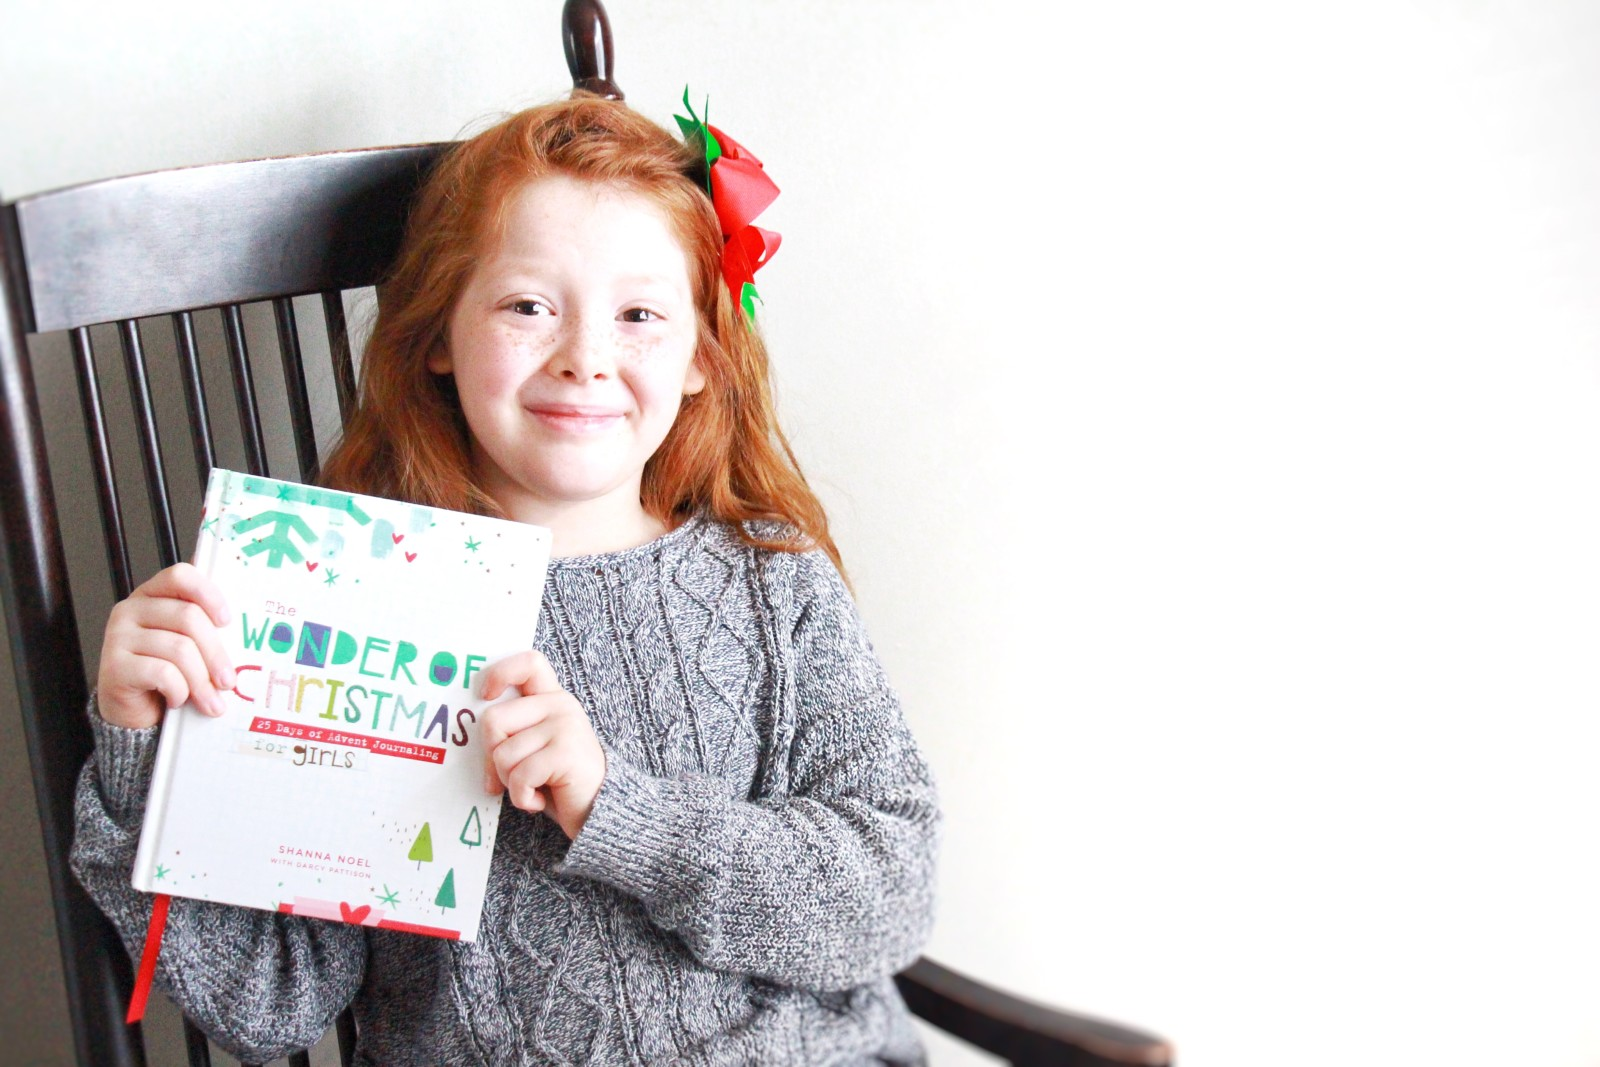 The Wonder of Christmas   Day 4   Bible Journaling With Kids by Bekah Lynn aka SimplyBekah